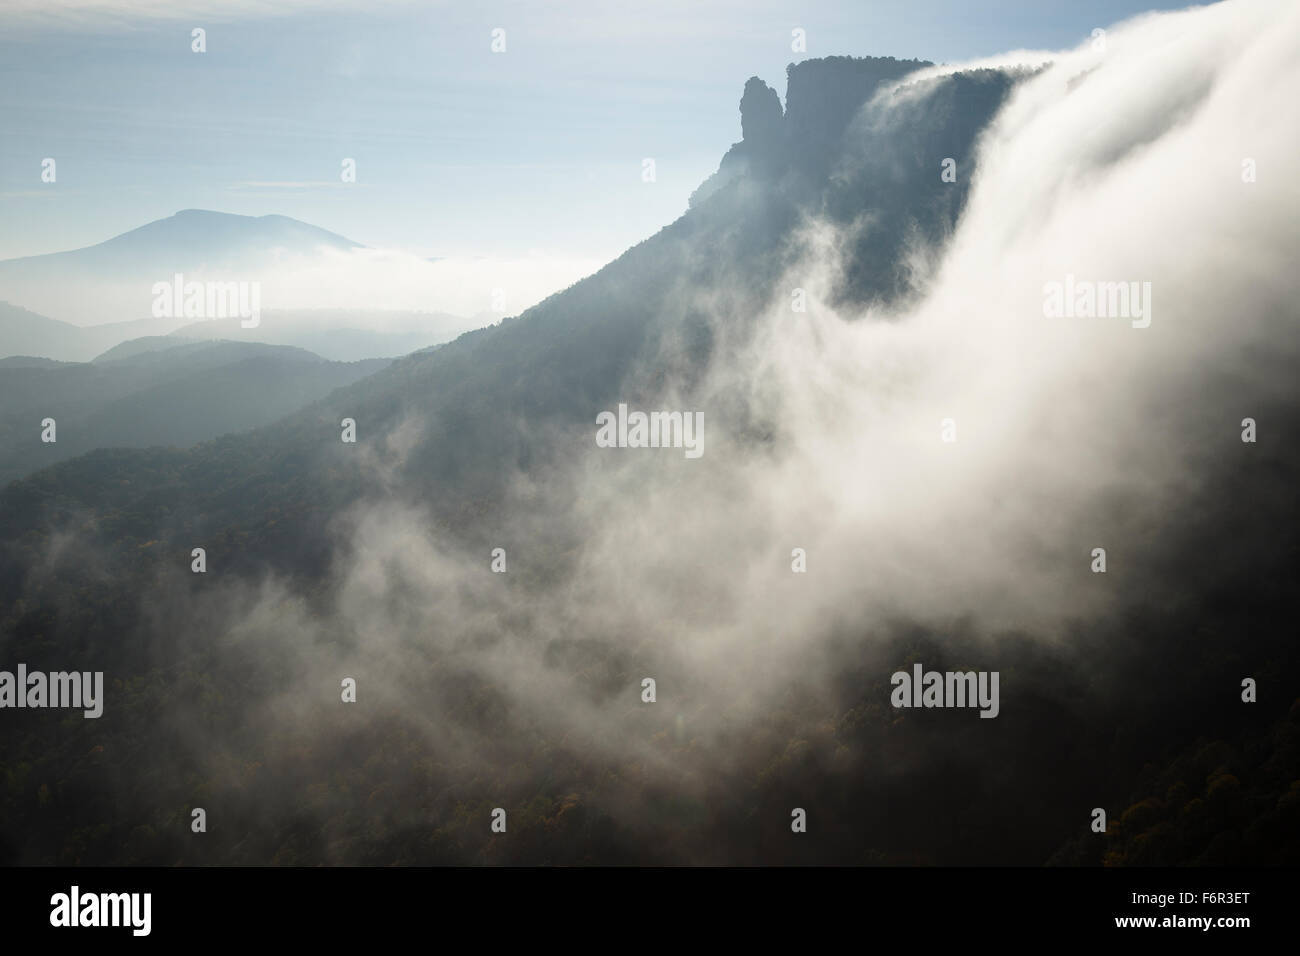 La niebla. Sal Sallent cascada. Rupit. Comarca de Osona. Barcelona. Cataluña. España. Europa Imagen De Stock